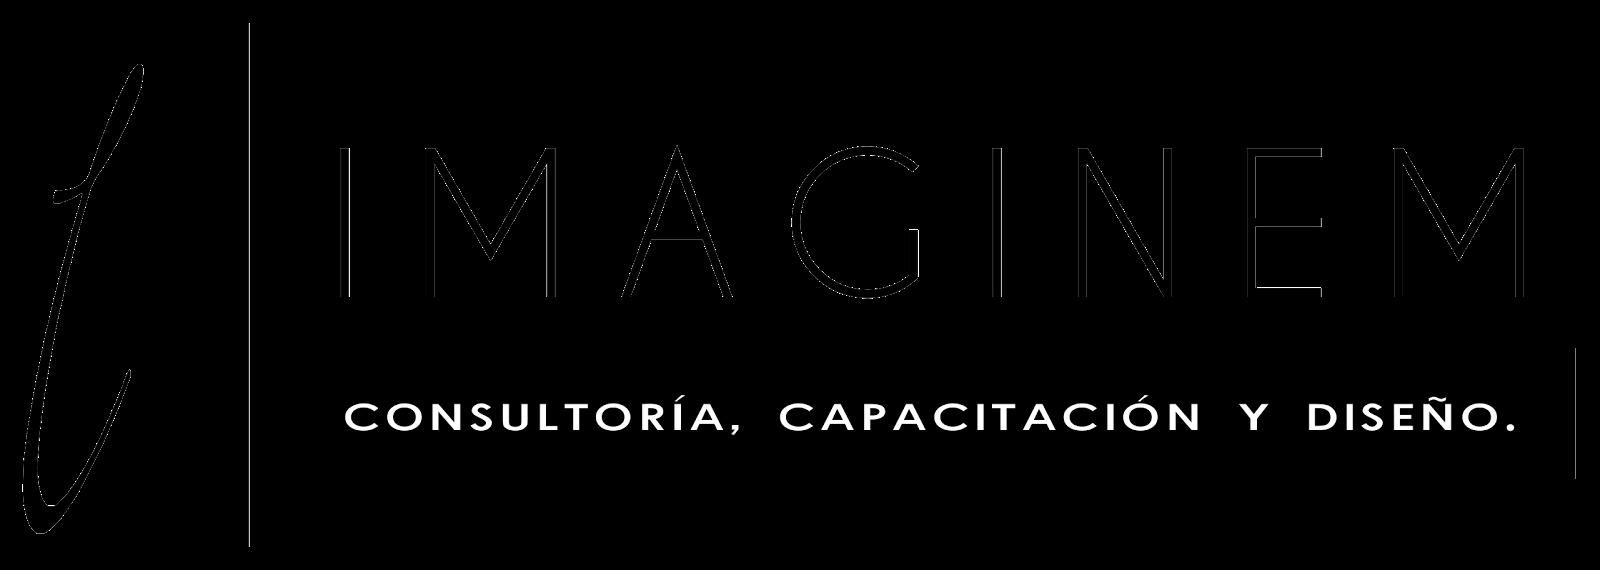 Imaginem